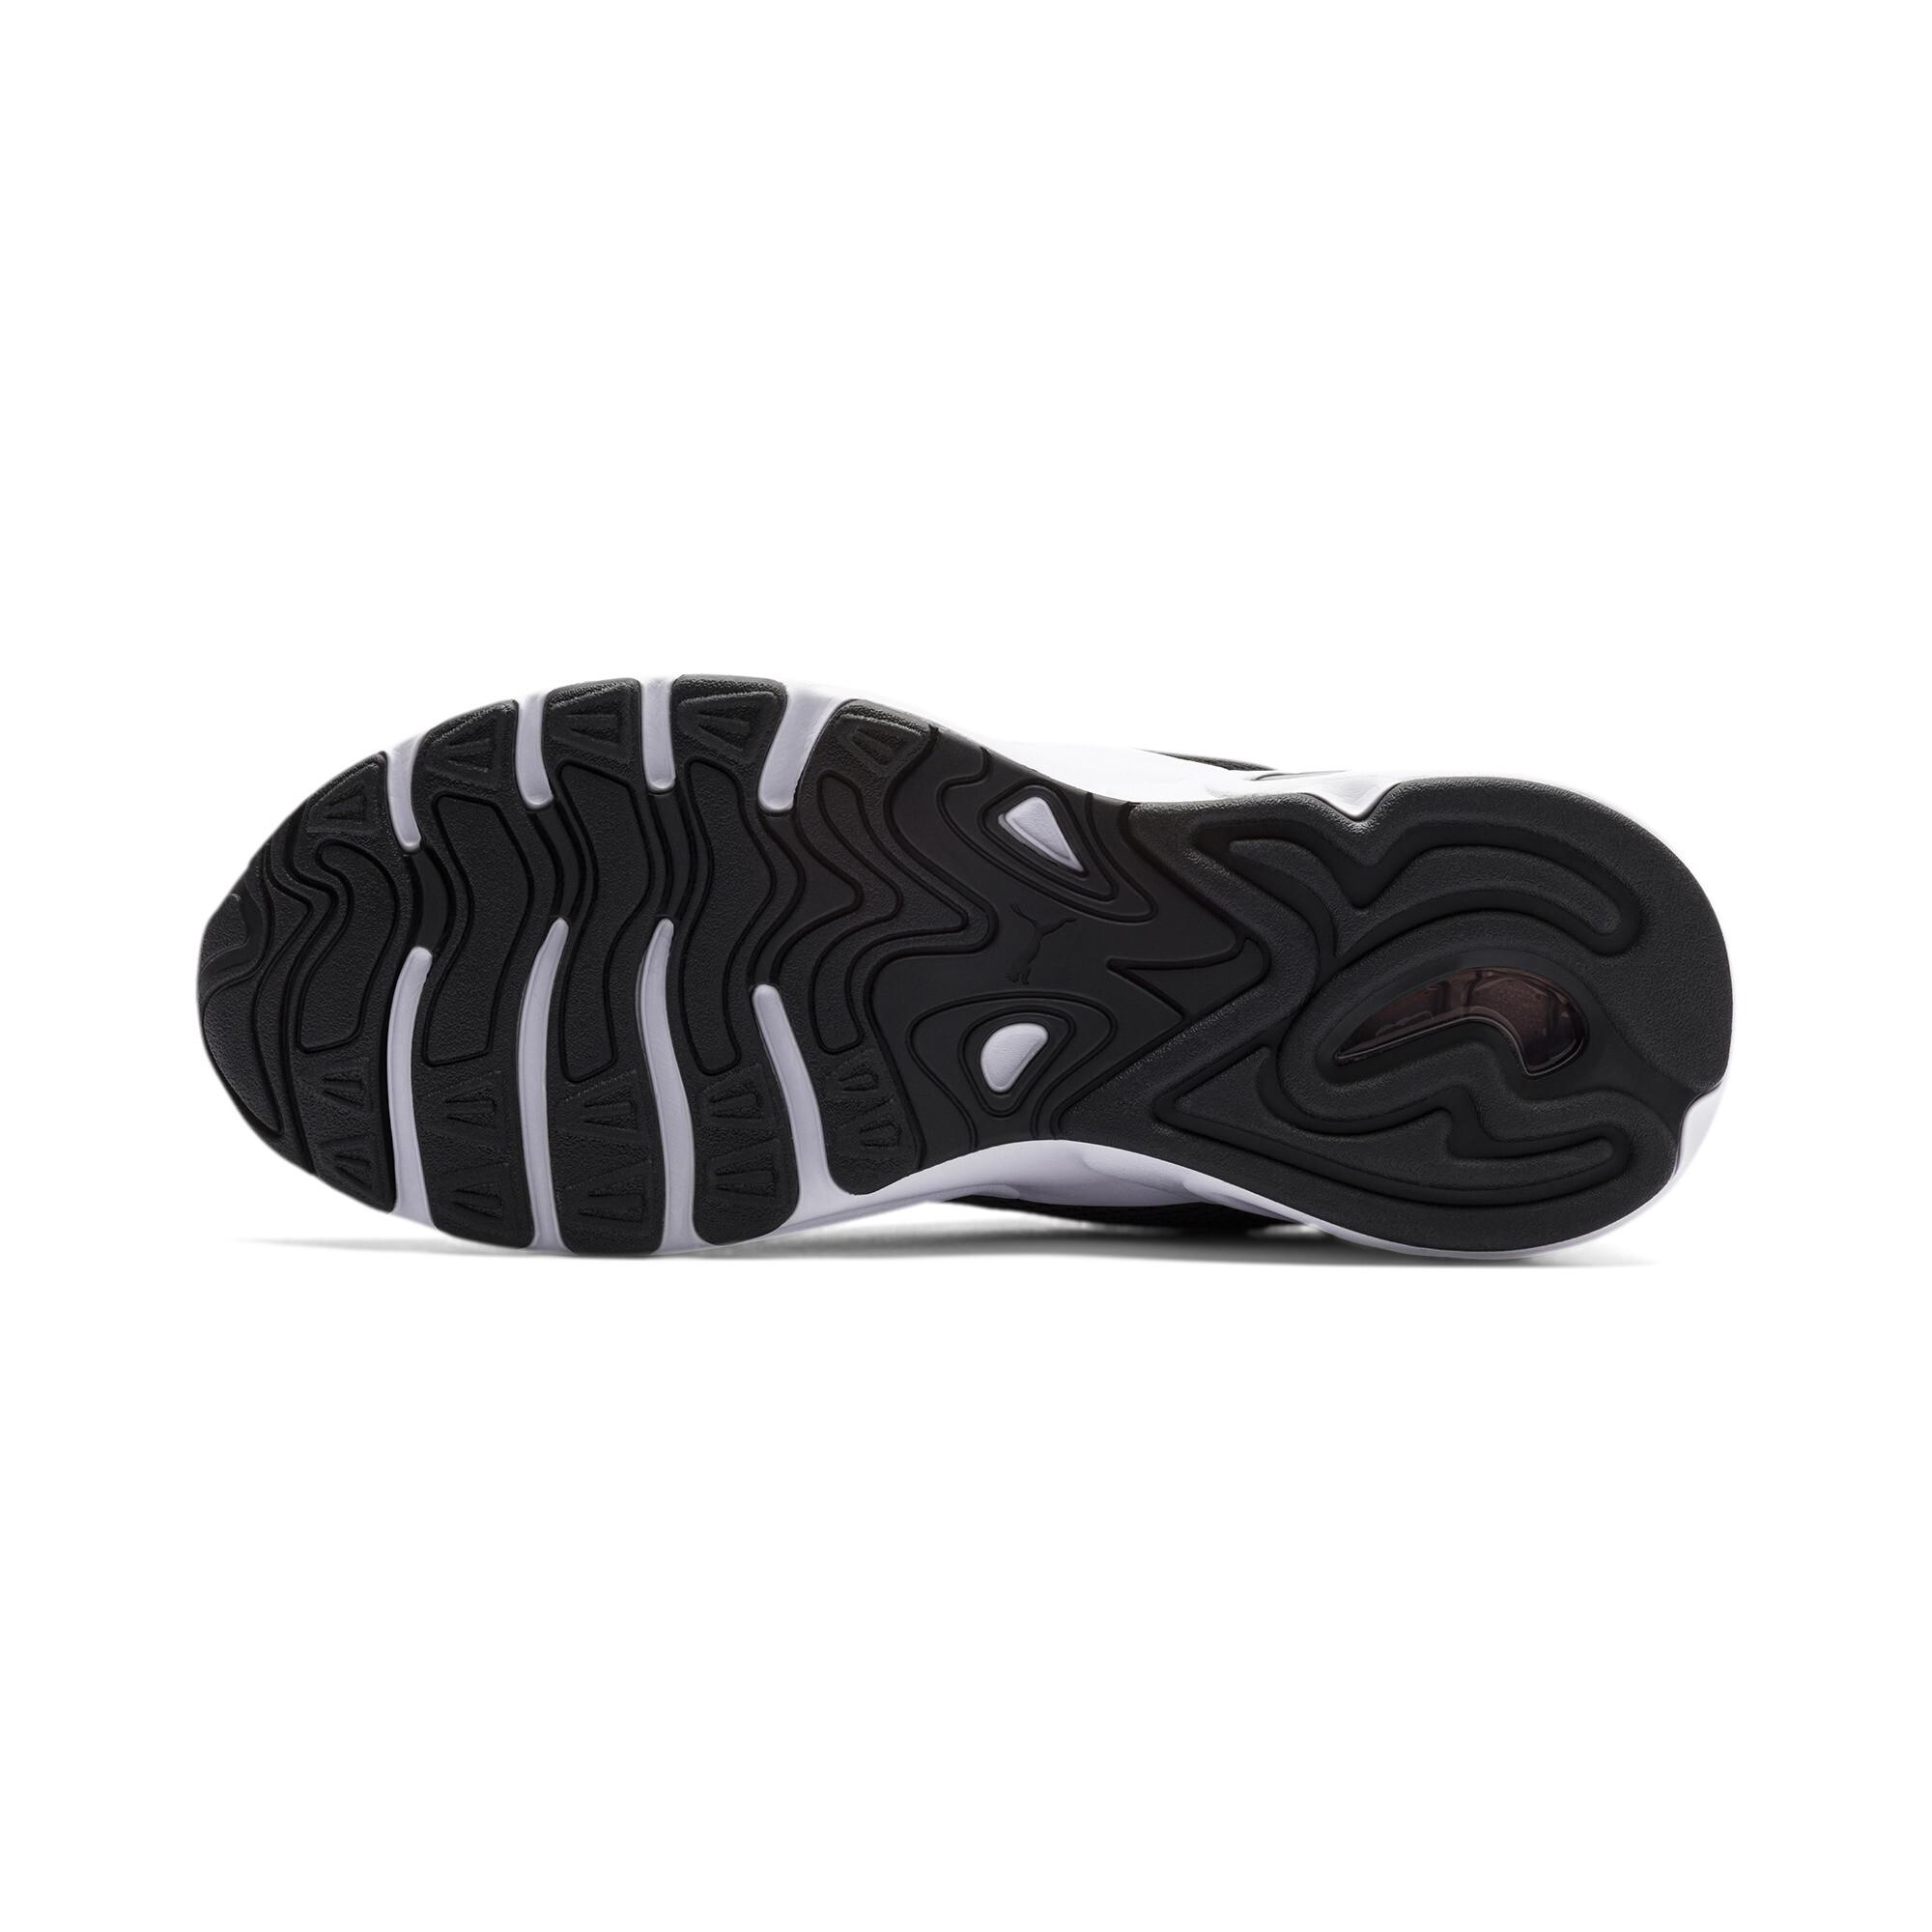 Indexbild 5 - PUMA CELL Viper Leather Sneaker Unisex Schuhe Sport Classics Neu